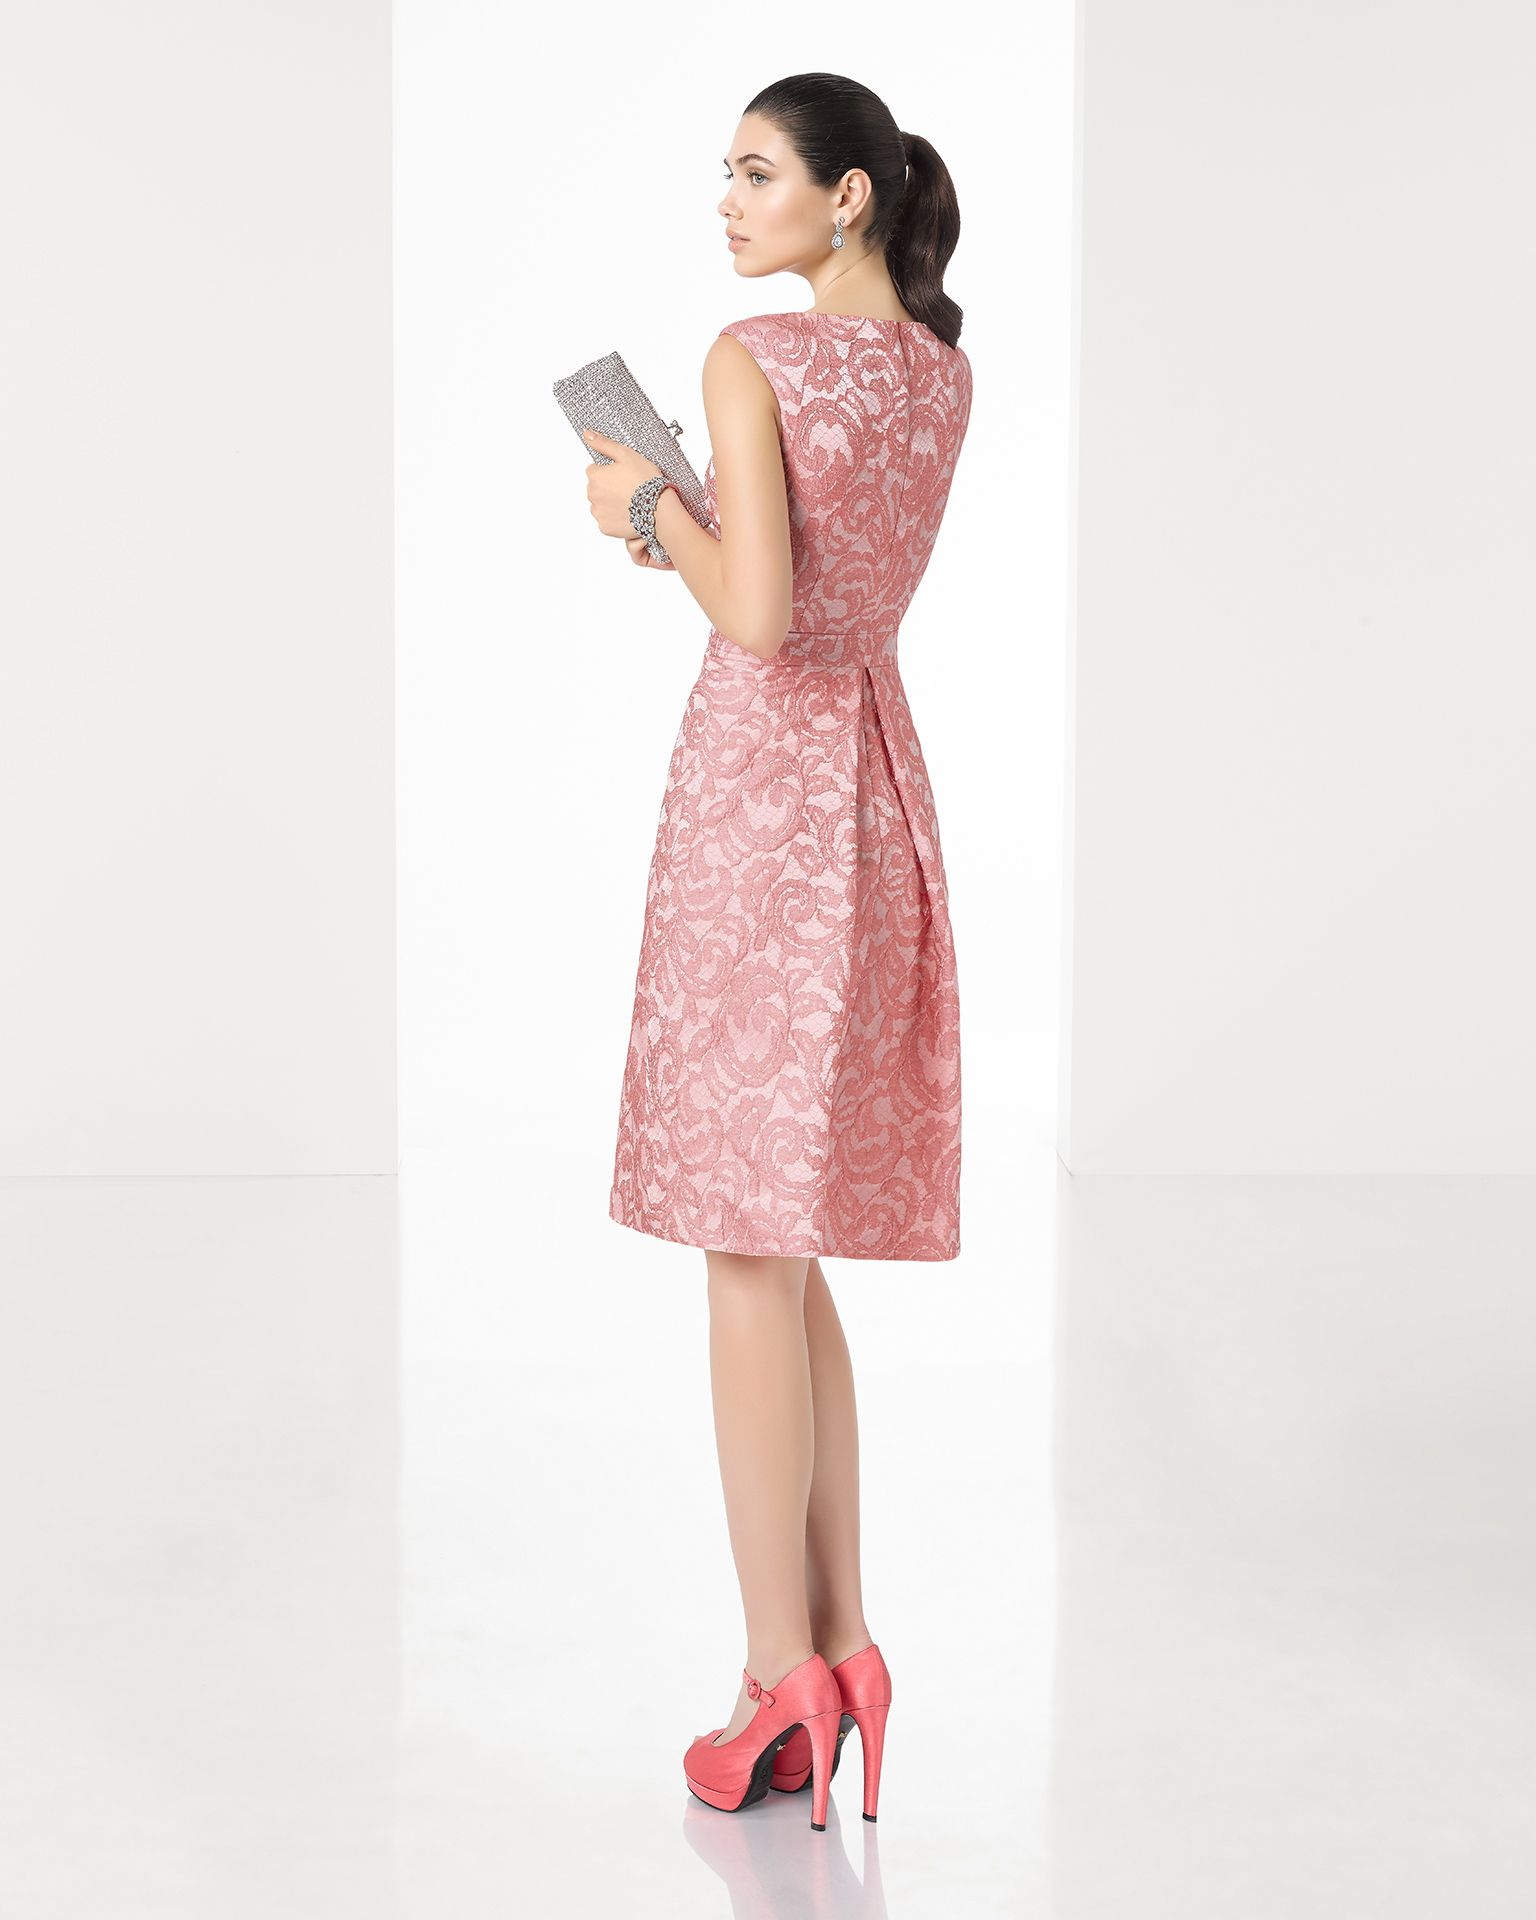 1T1E6 | Cosas que ponerse | Pinterest | Rosa clará, Vestidos de ...